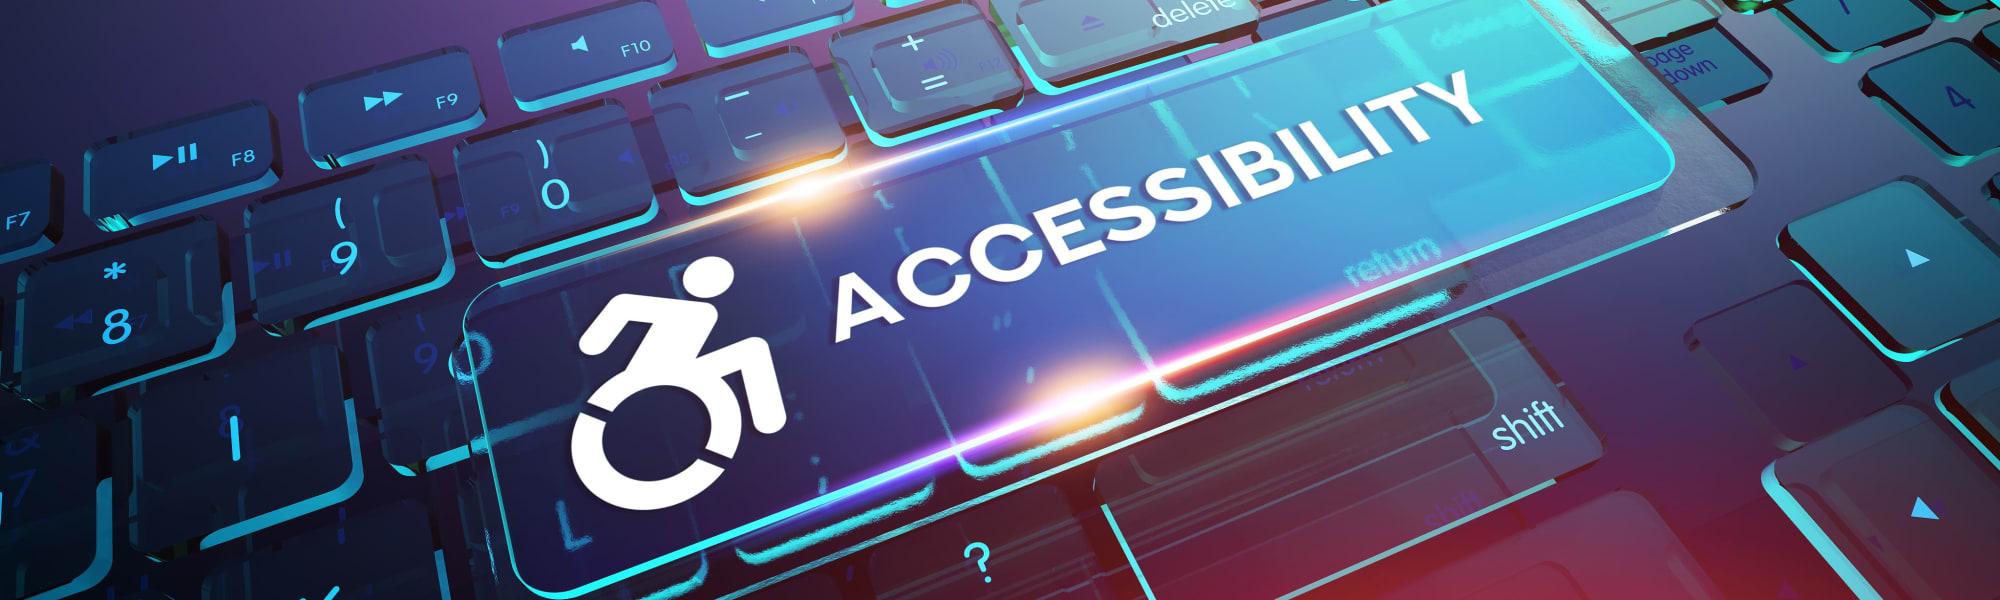 Accessibility policy for Mosaic Dallas in Dallas, Texas